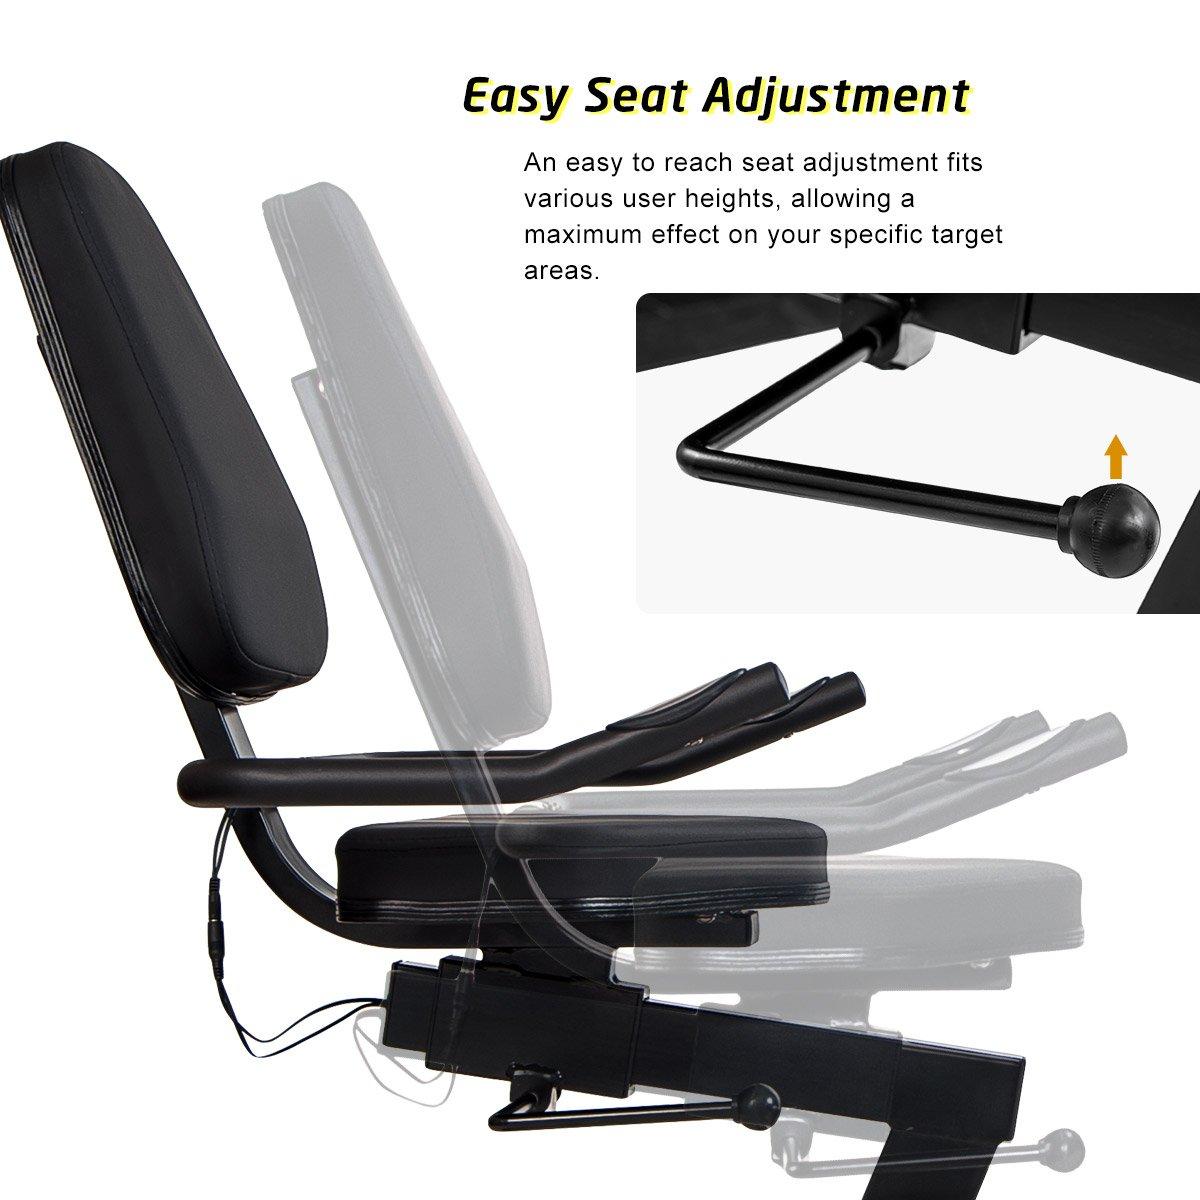 Merax Magnetic Recumbent Exercise Bike | 8-Level Resistance | Quick Adjust Seat (Black 2019) by Merax (Image #5)